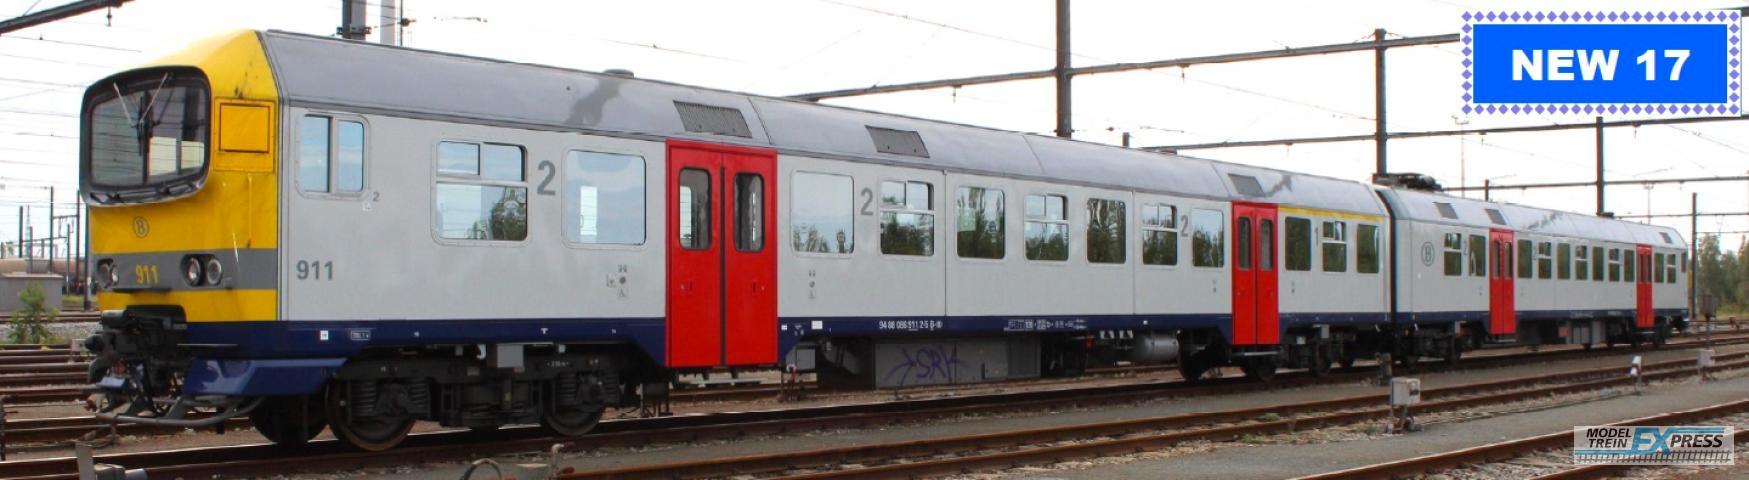 B-Models 4004.06L